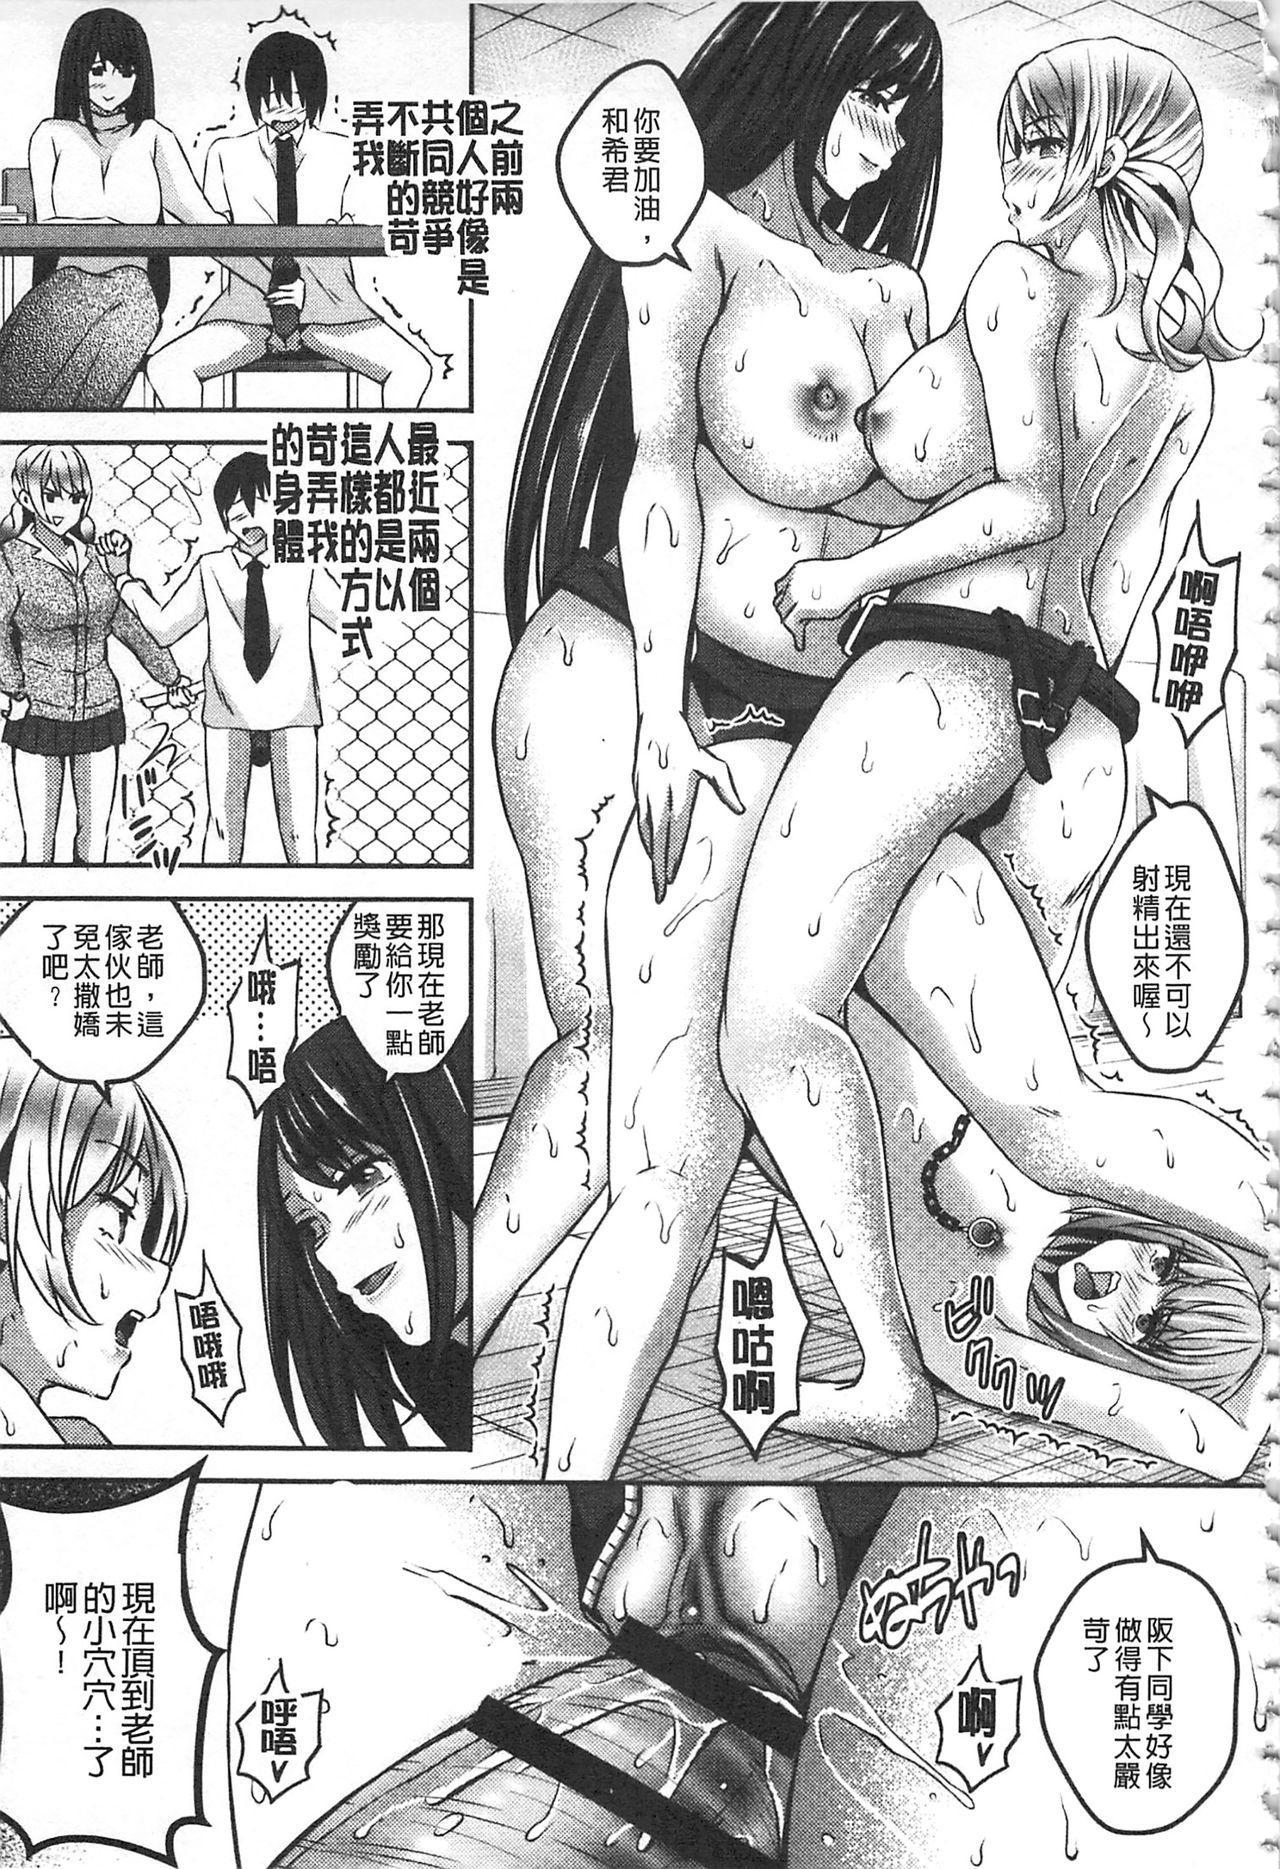 Kanjuku Otome no Odoshikata | 姦熟乙女的脅迫法 44